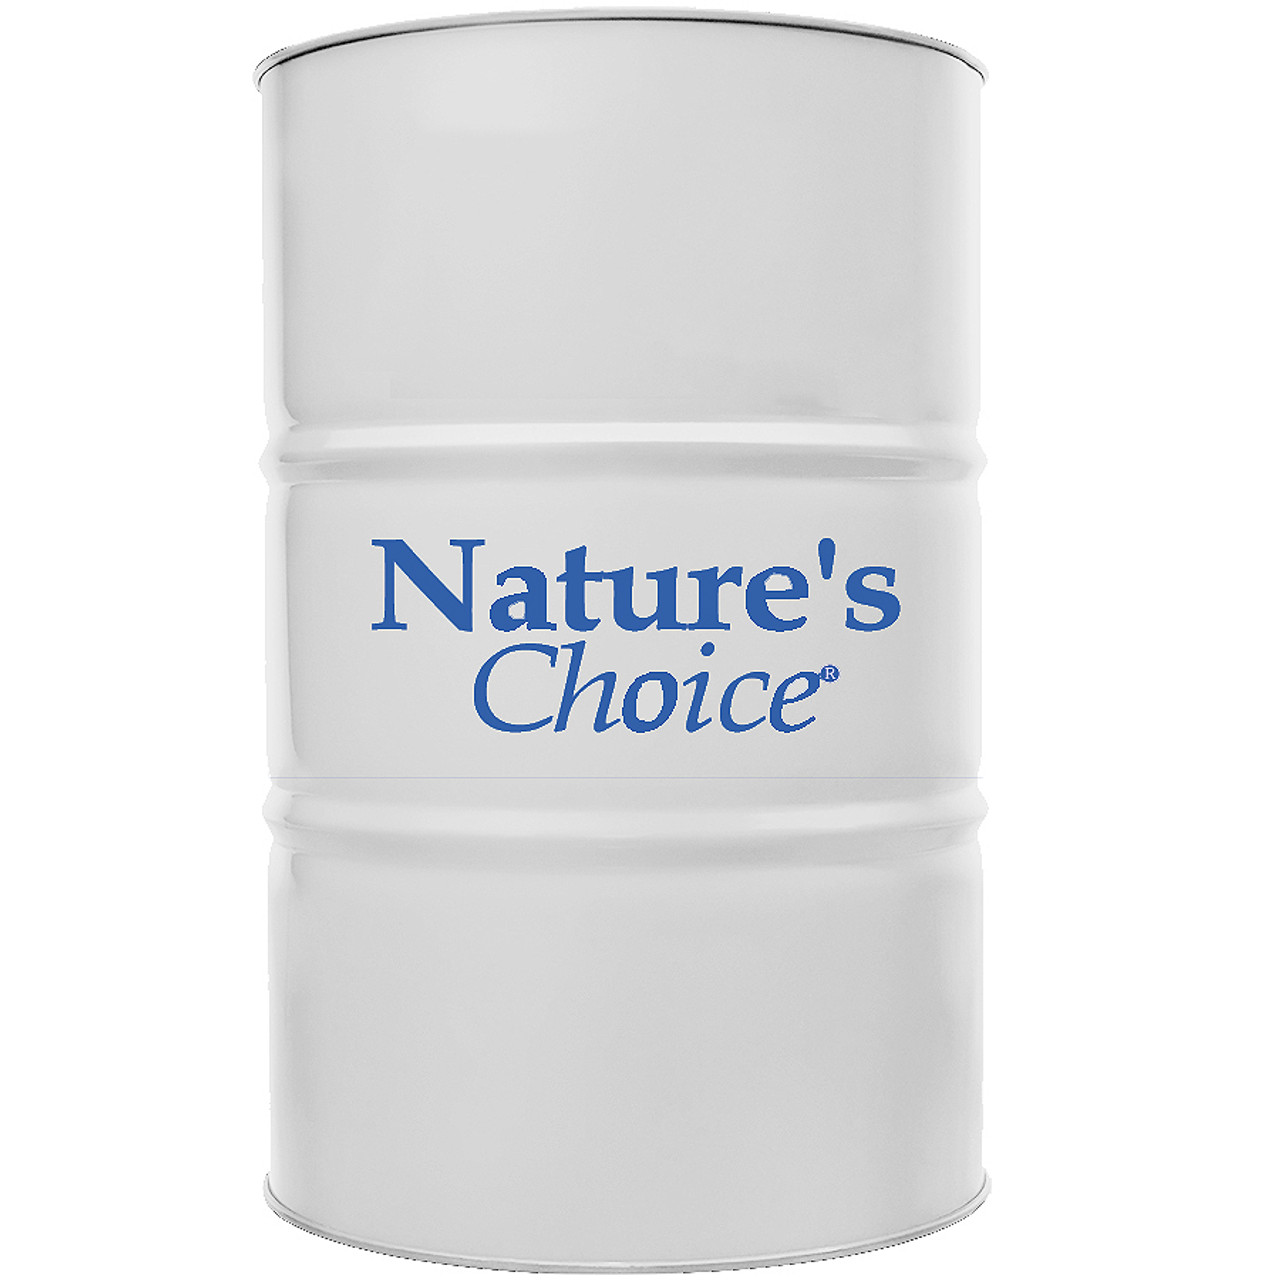 Nature's Choice SynBlend Re-Refined SN PLUS/GF-5 5W-20 - 55 Gallon Drum